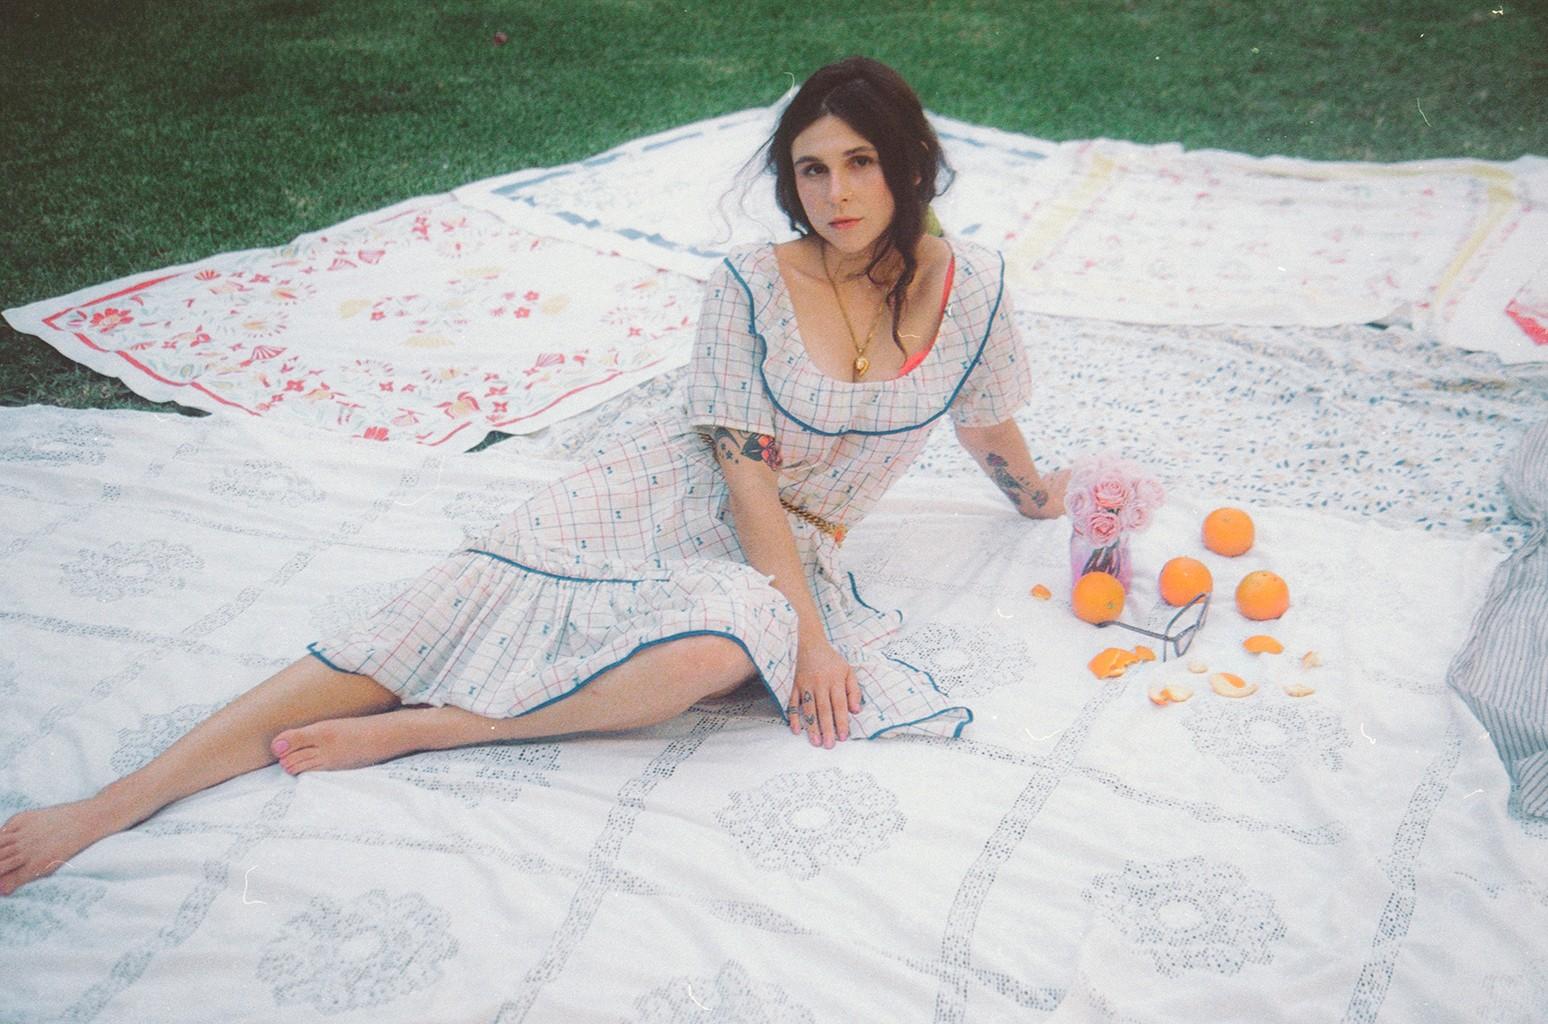 Sophie Strauss